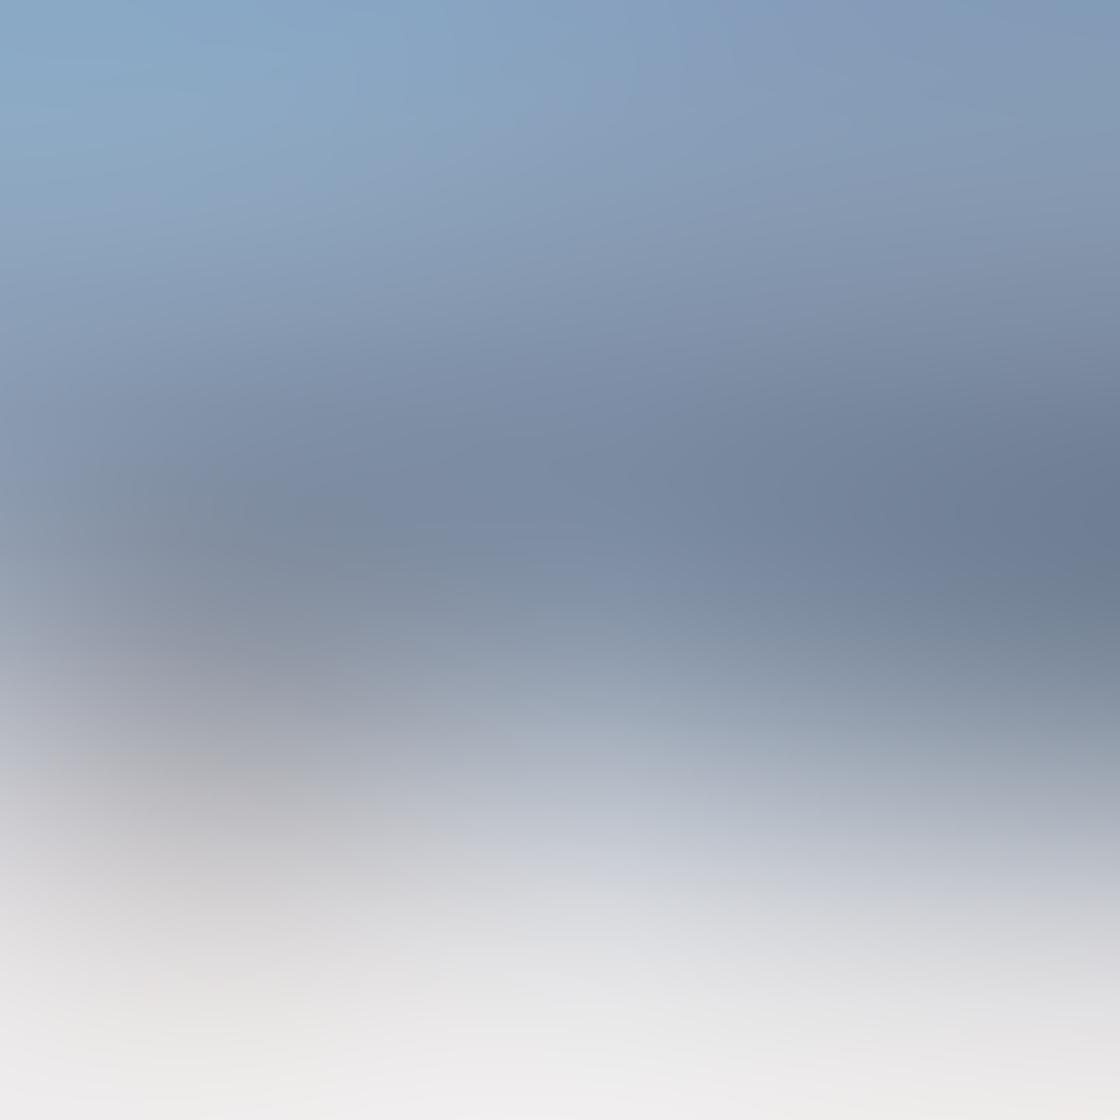 iPhone Photography Snow 105